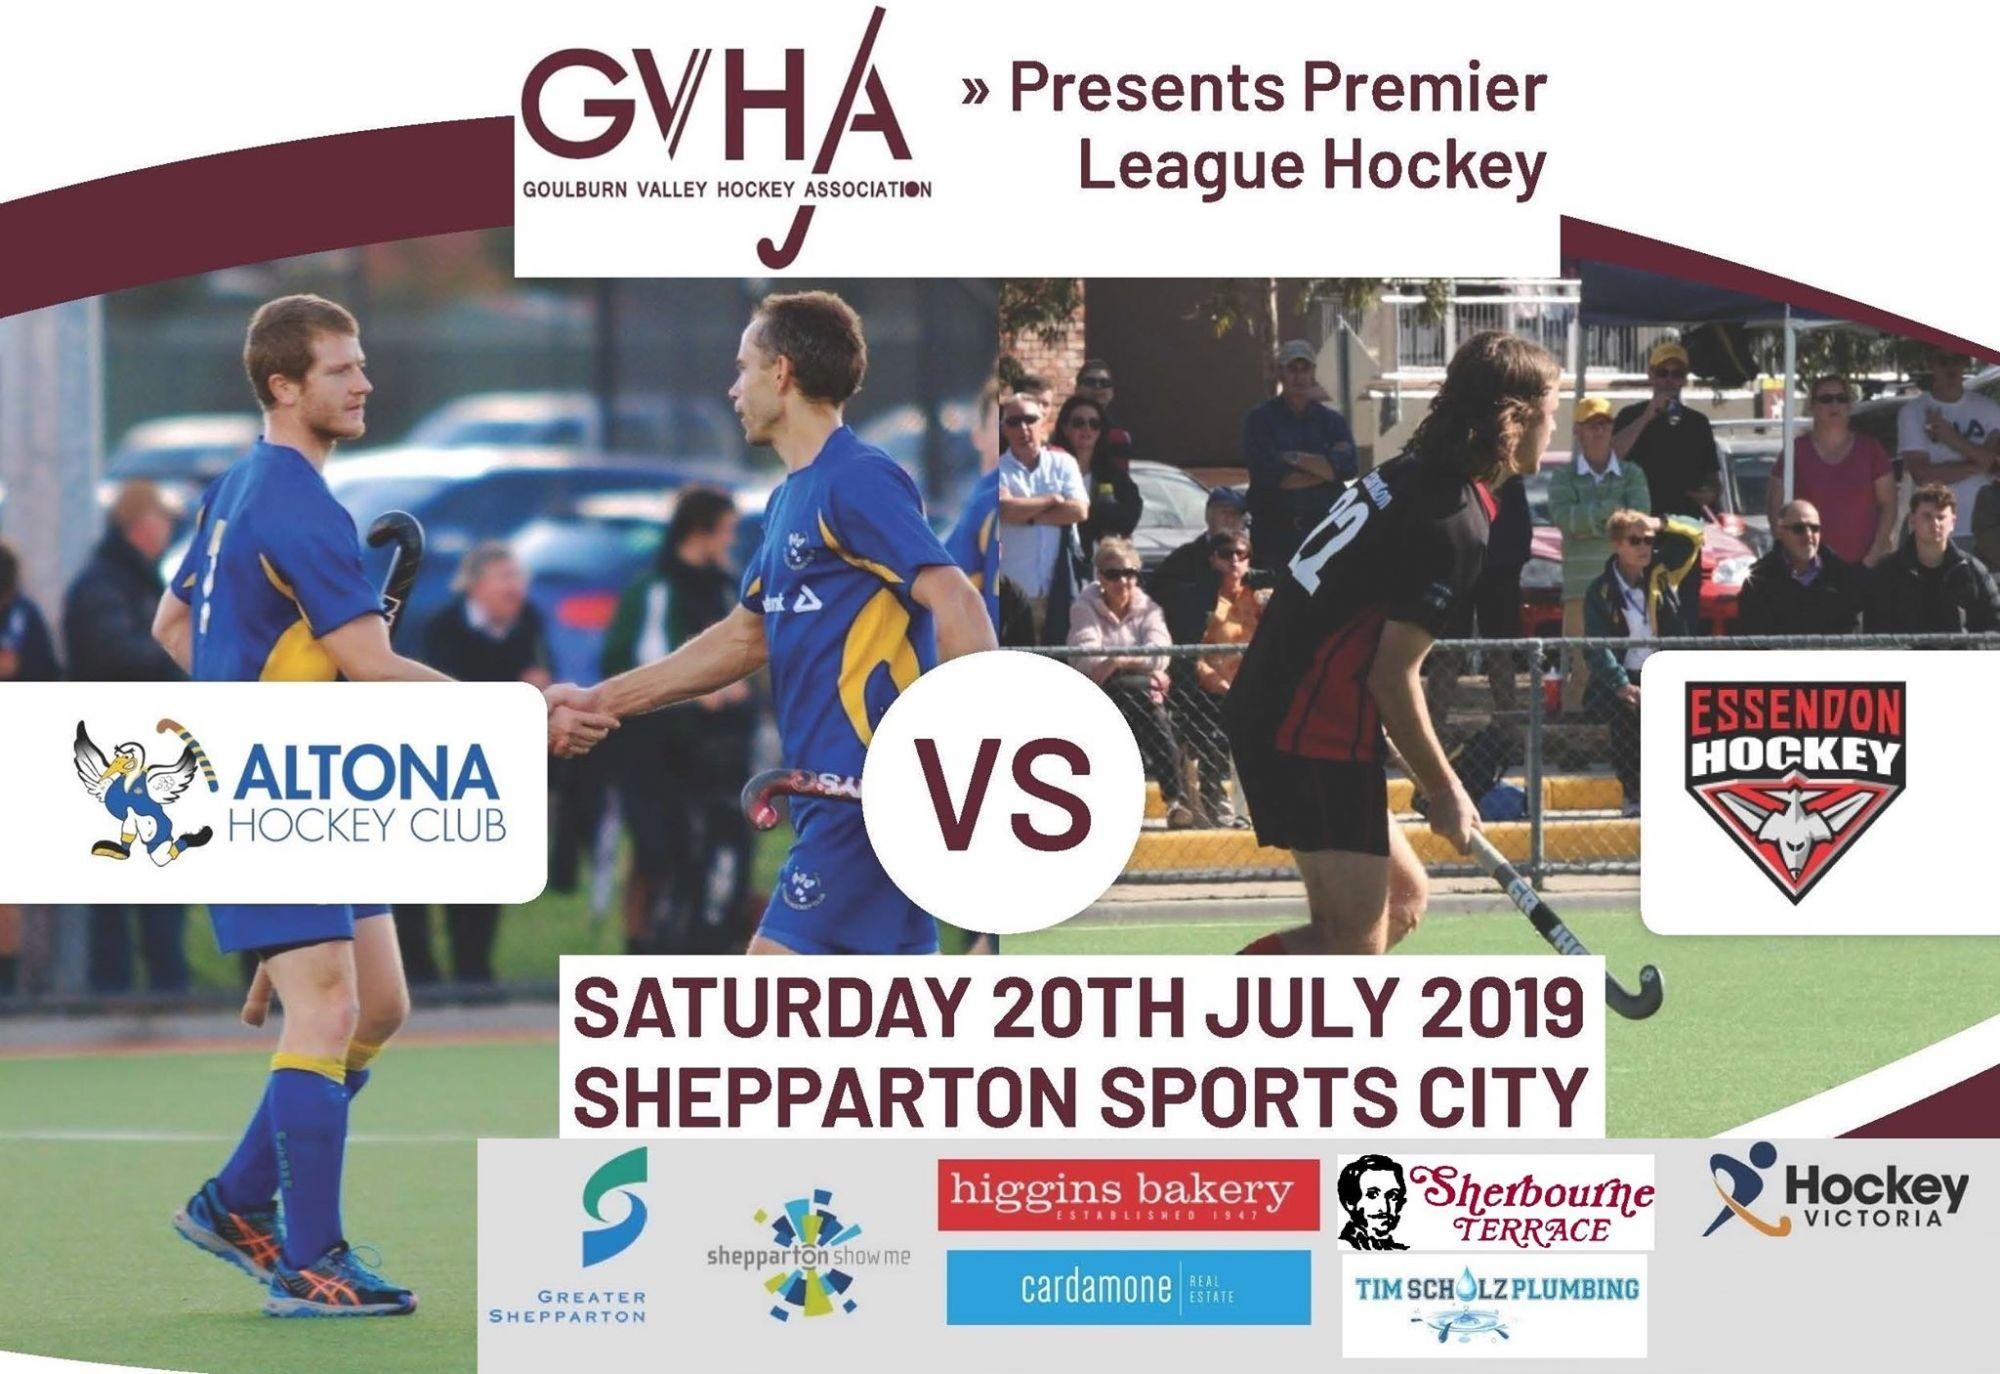 Victorian Premier League Hockey - Greater Shepparton City